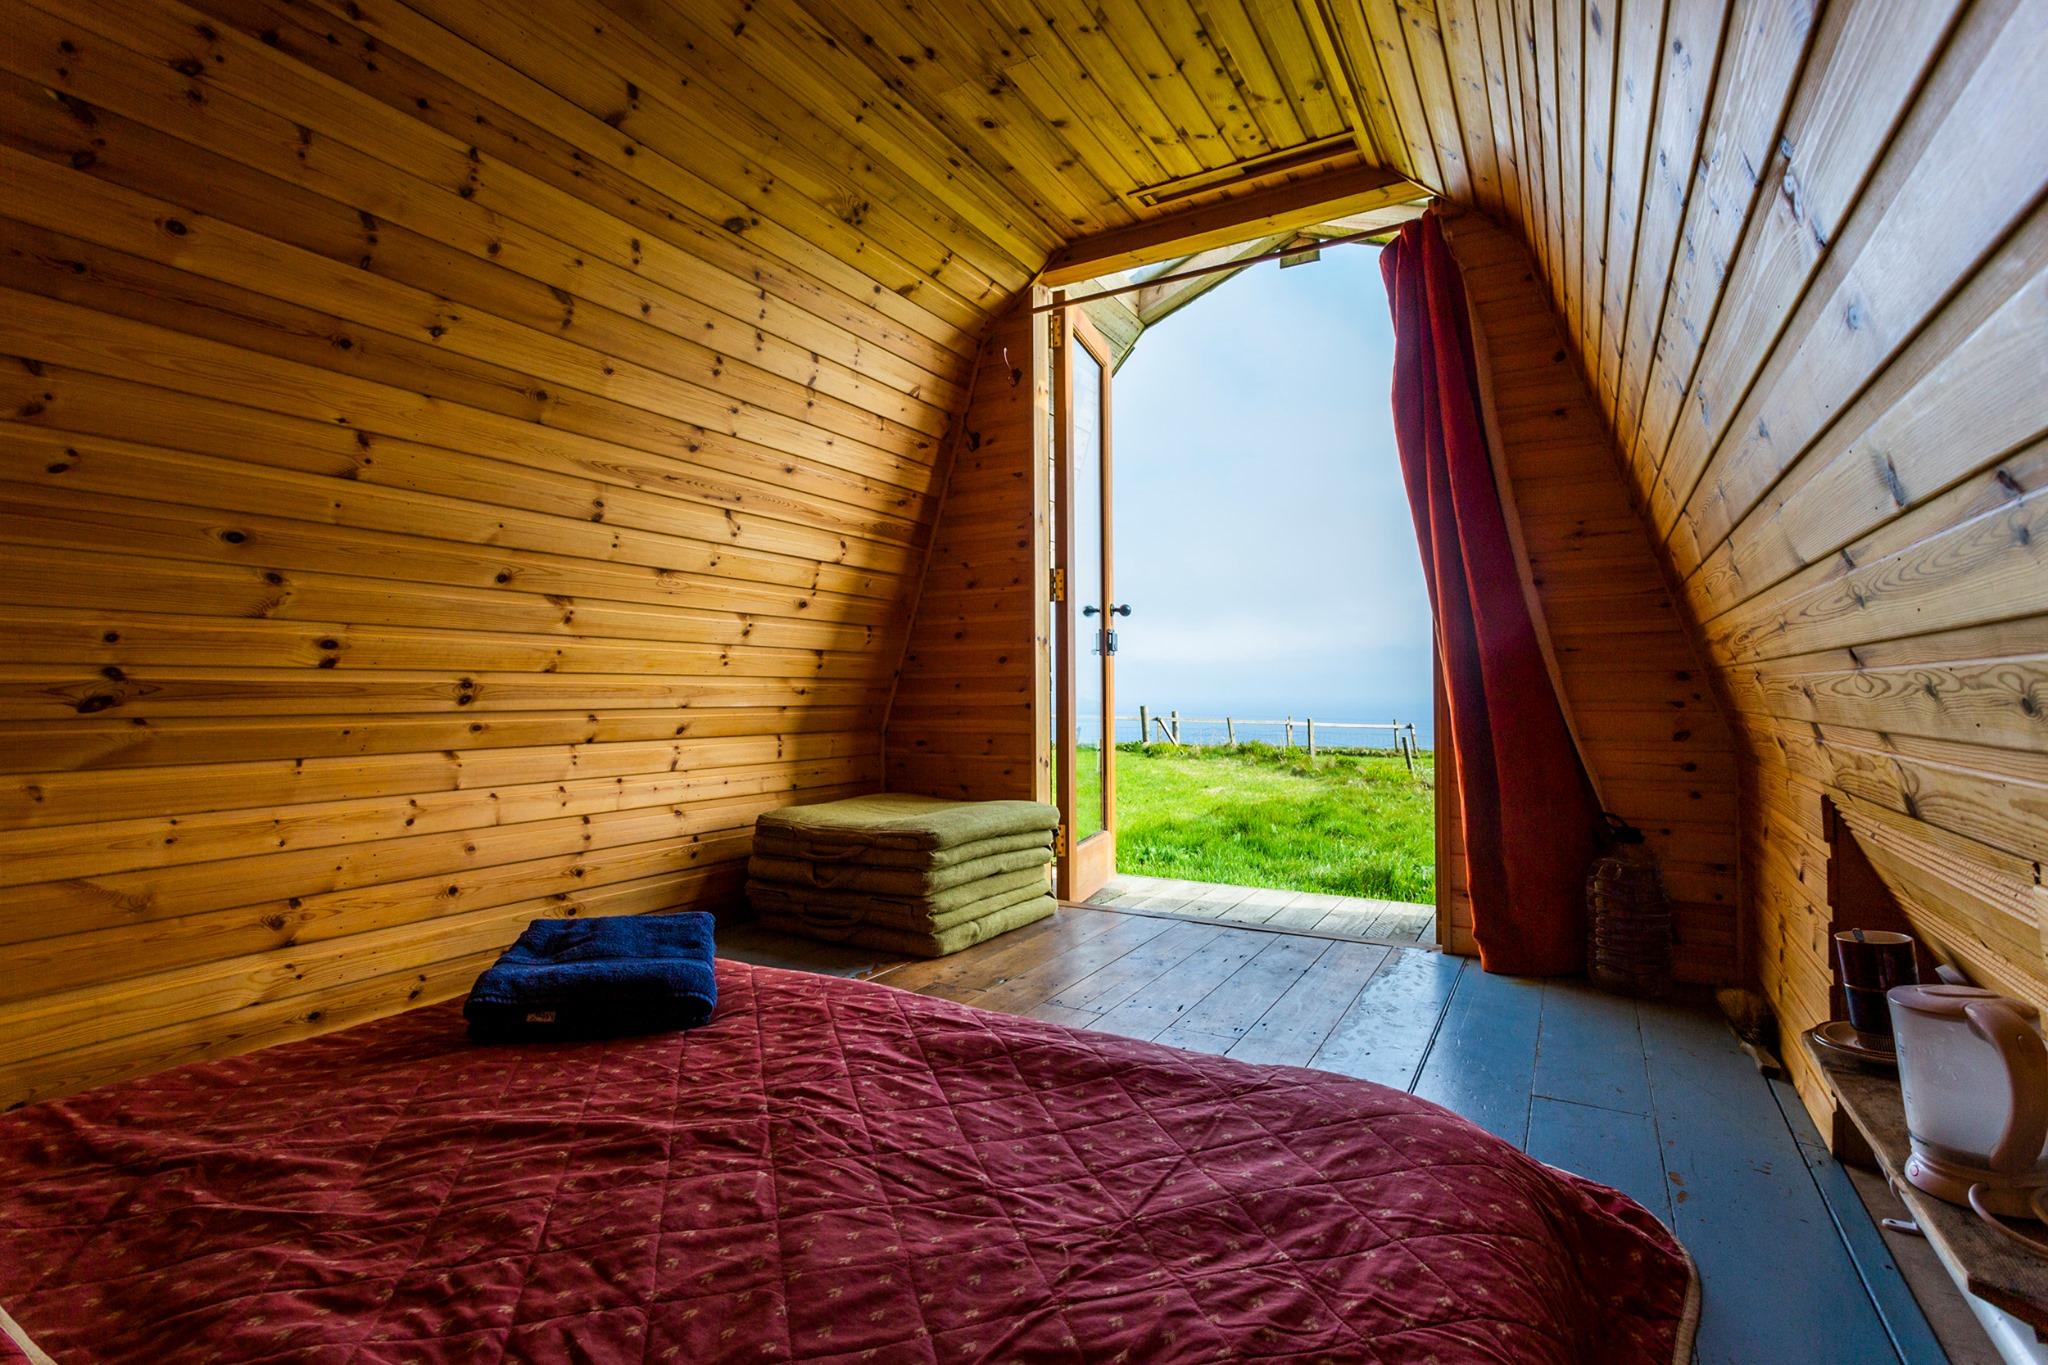 Wheems Organic Farm glamping cabin (Image: Wheems Organic Farm Campsite & Eco Cabins/Facebook)